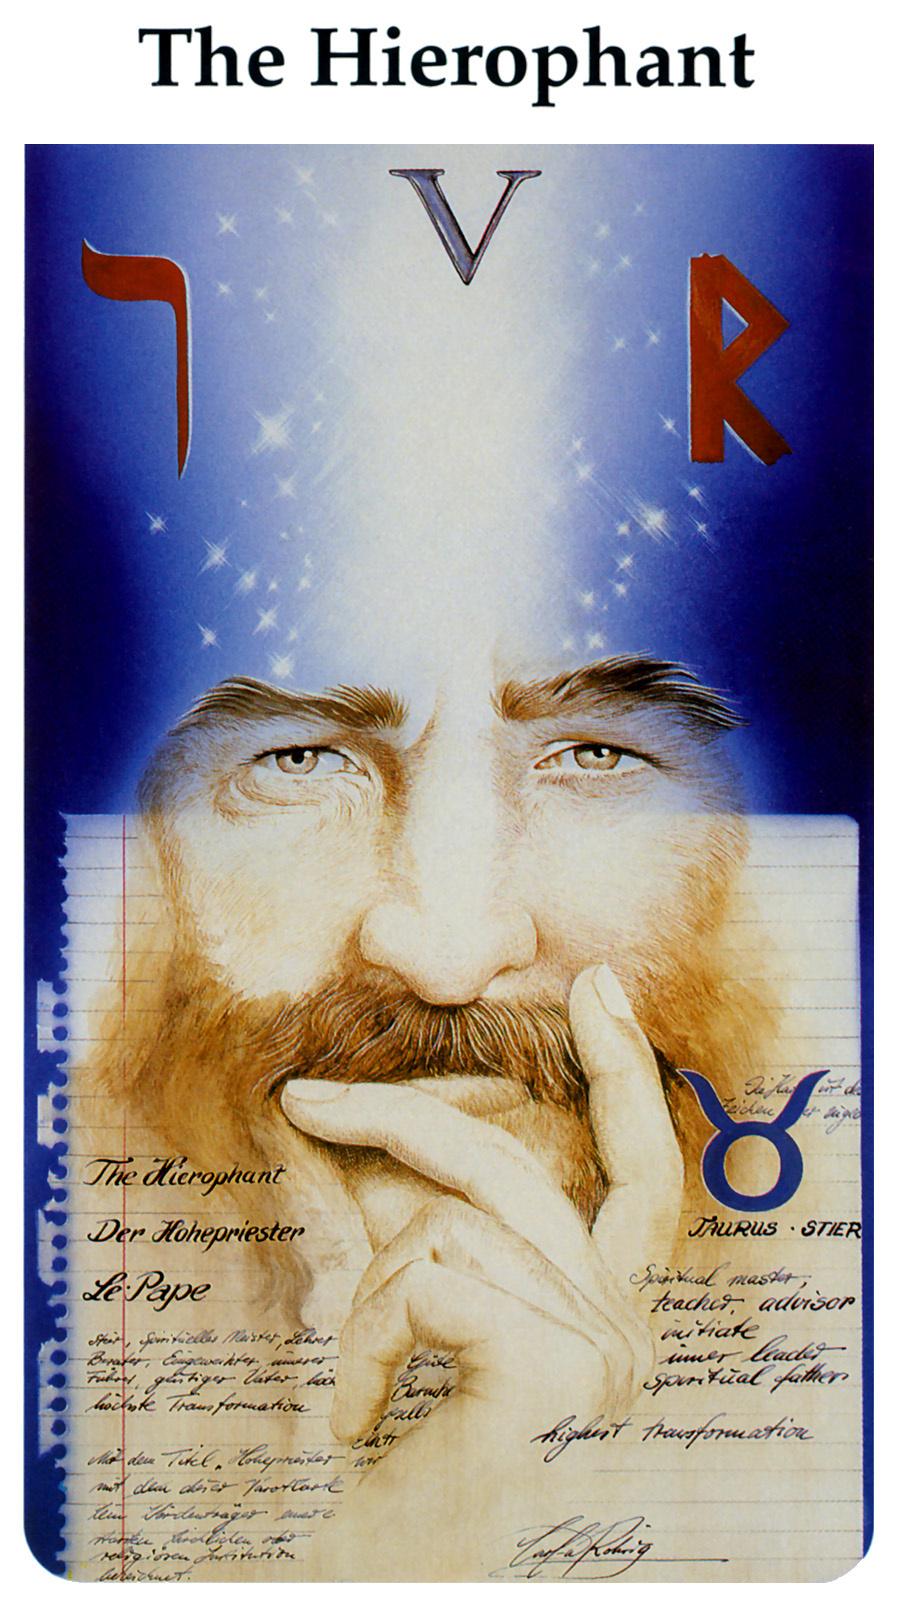 Karl Rohrig. Tarot Of The Third Millennium. The Hierophant